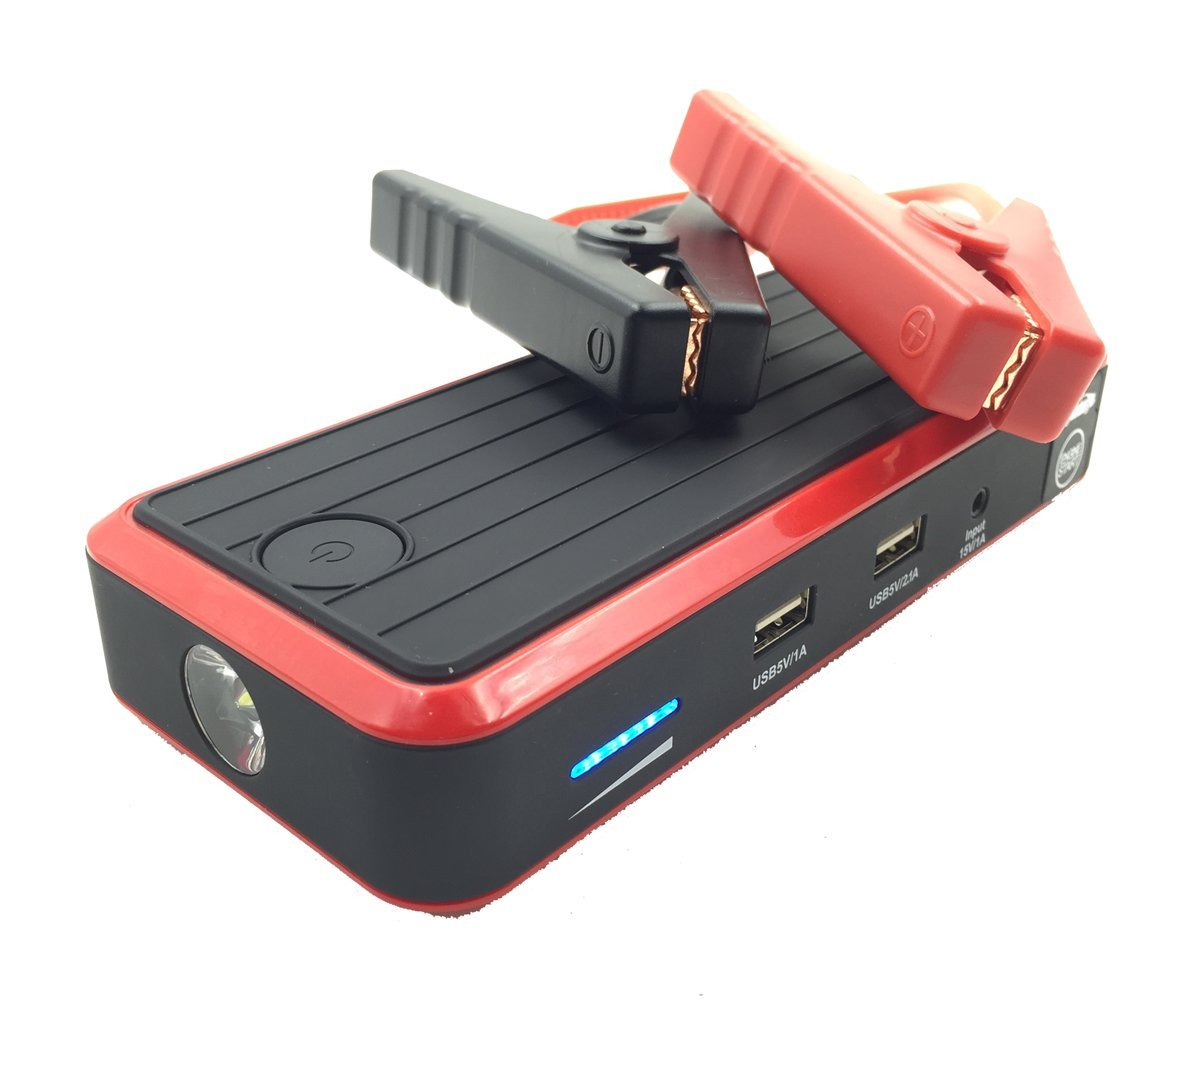 Imazing IM7 12000mAh Red/Black Portable Power Bank and Car